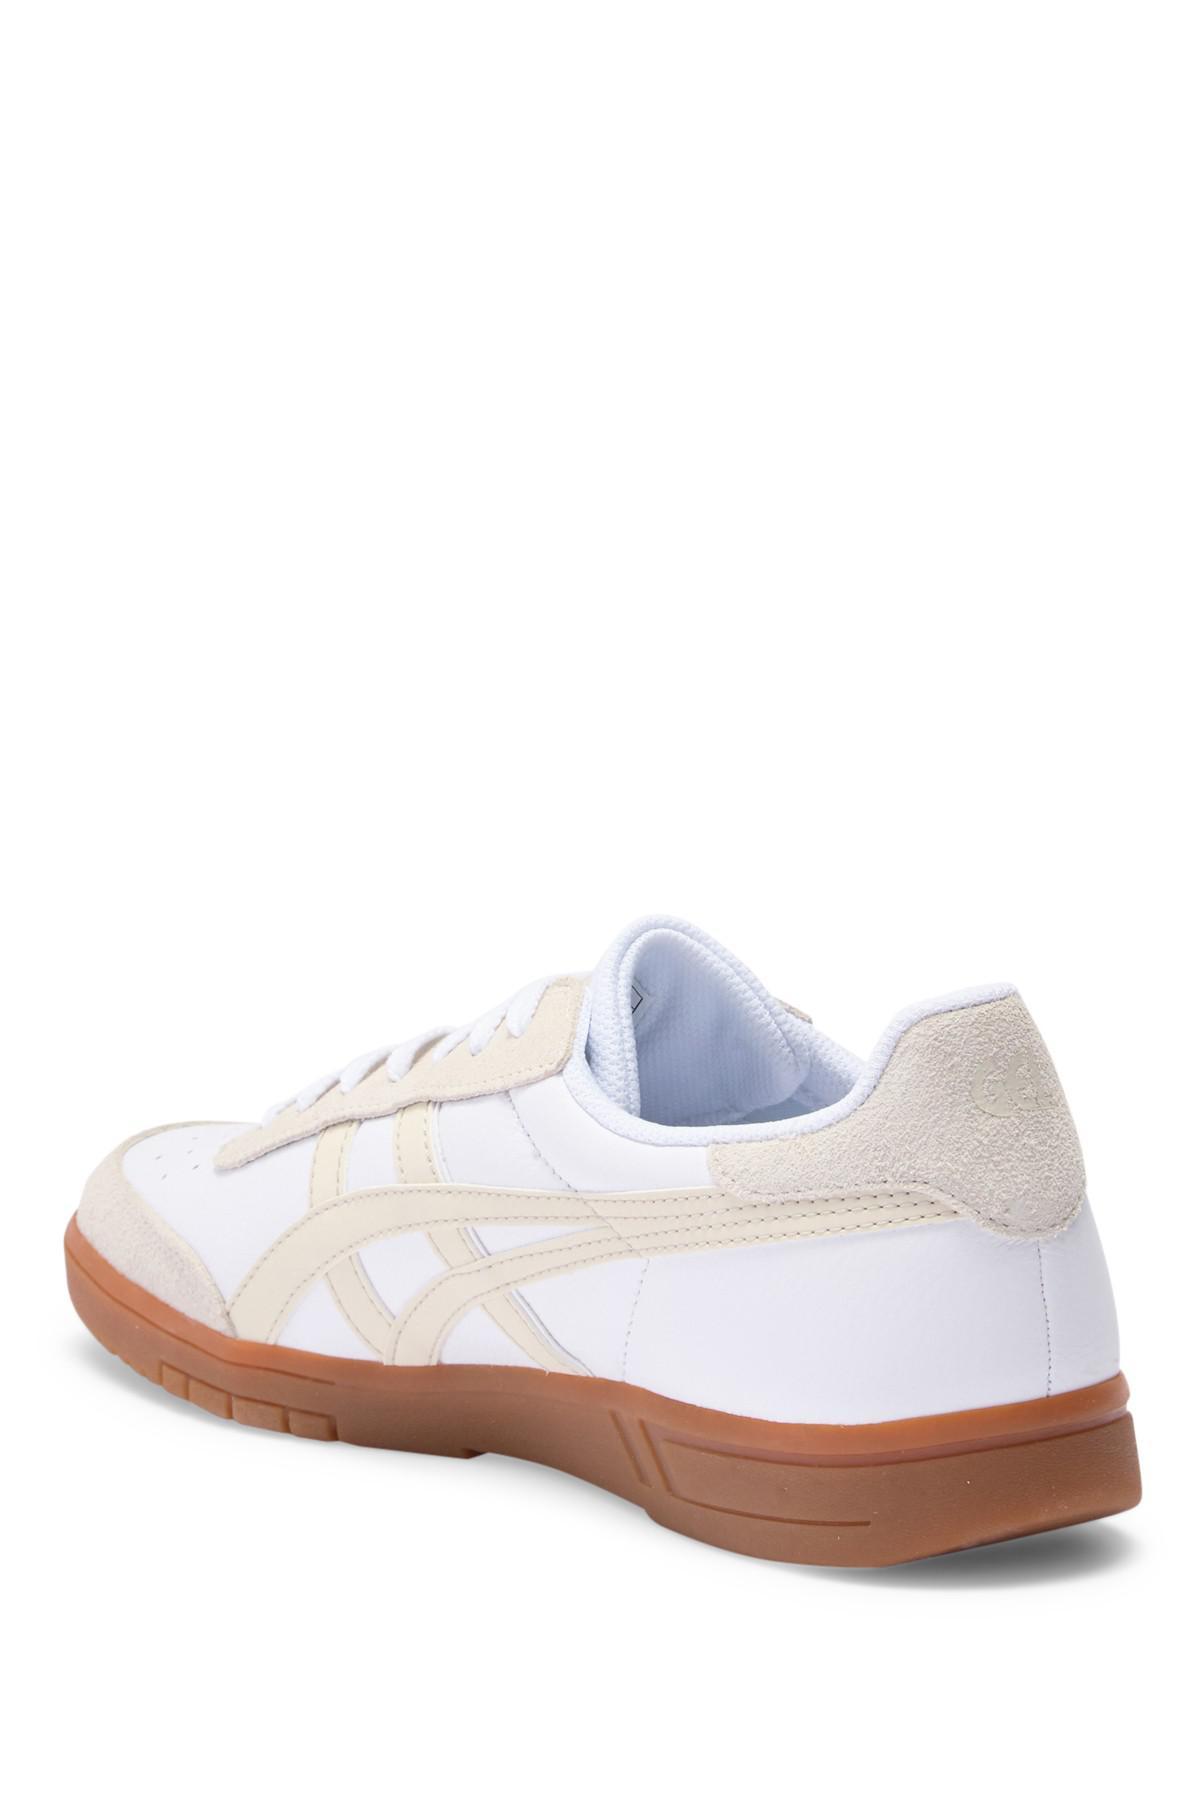 detailing 5f6f6 9a5f3 asicsr-WHITEBIRC-Gel-vickka-Trs-Leather-Sneaker.jpeg